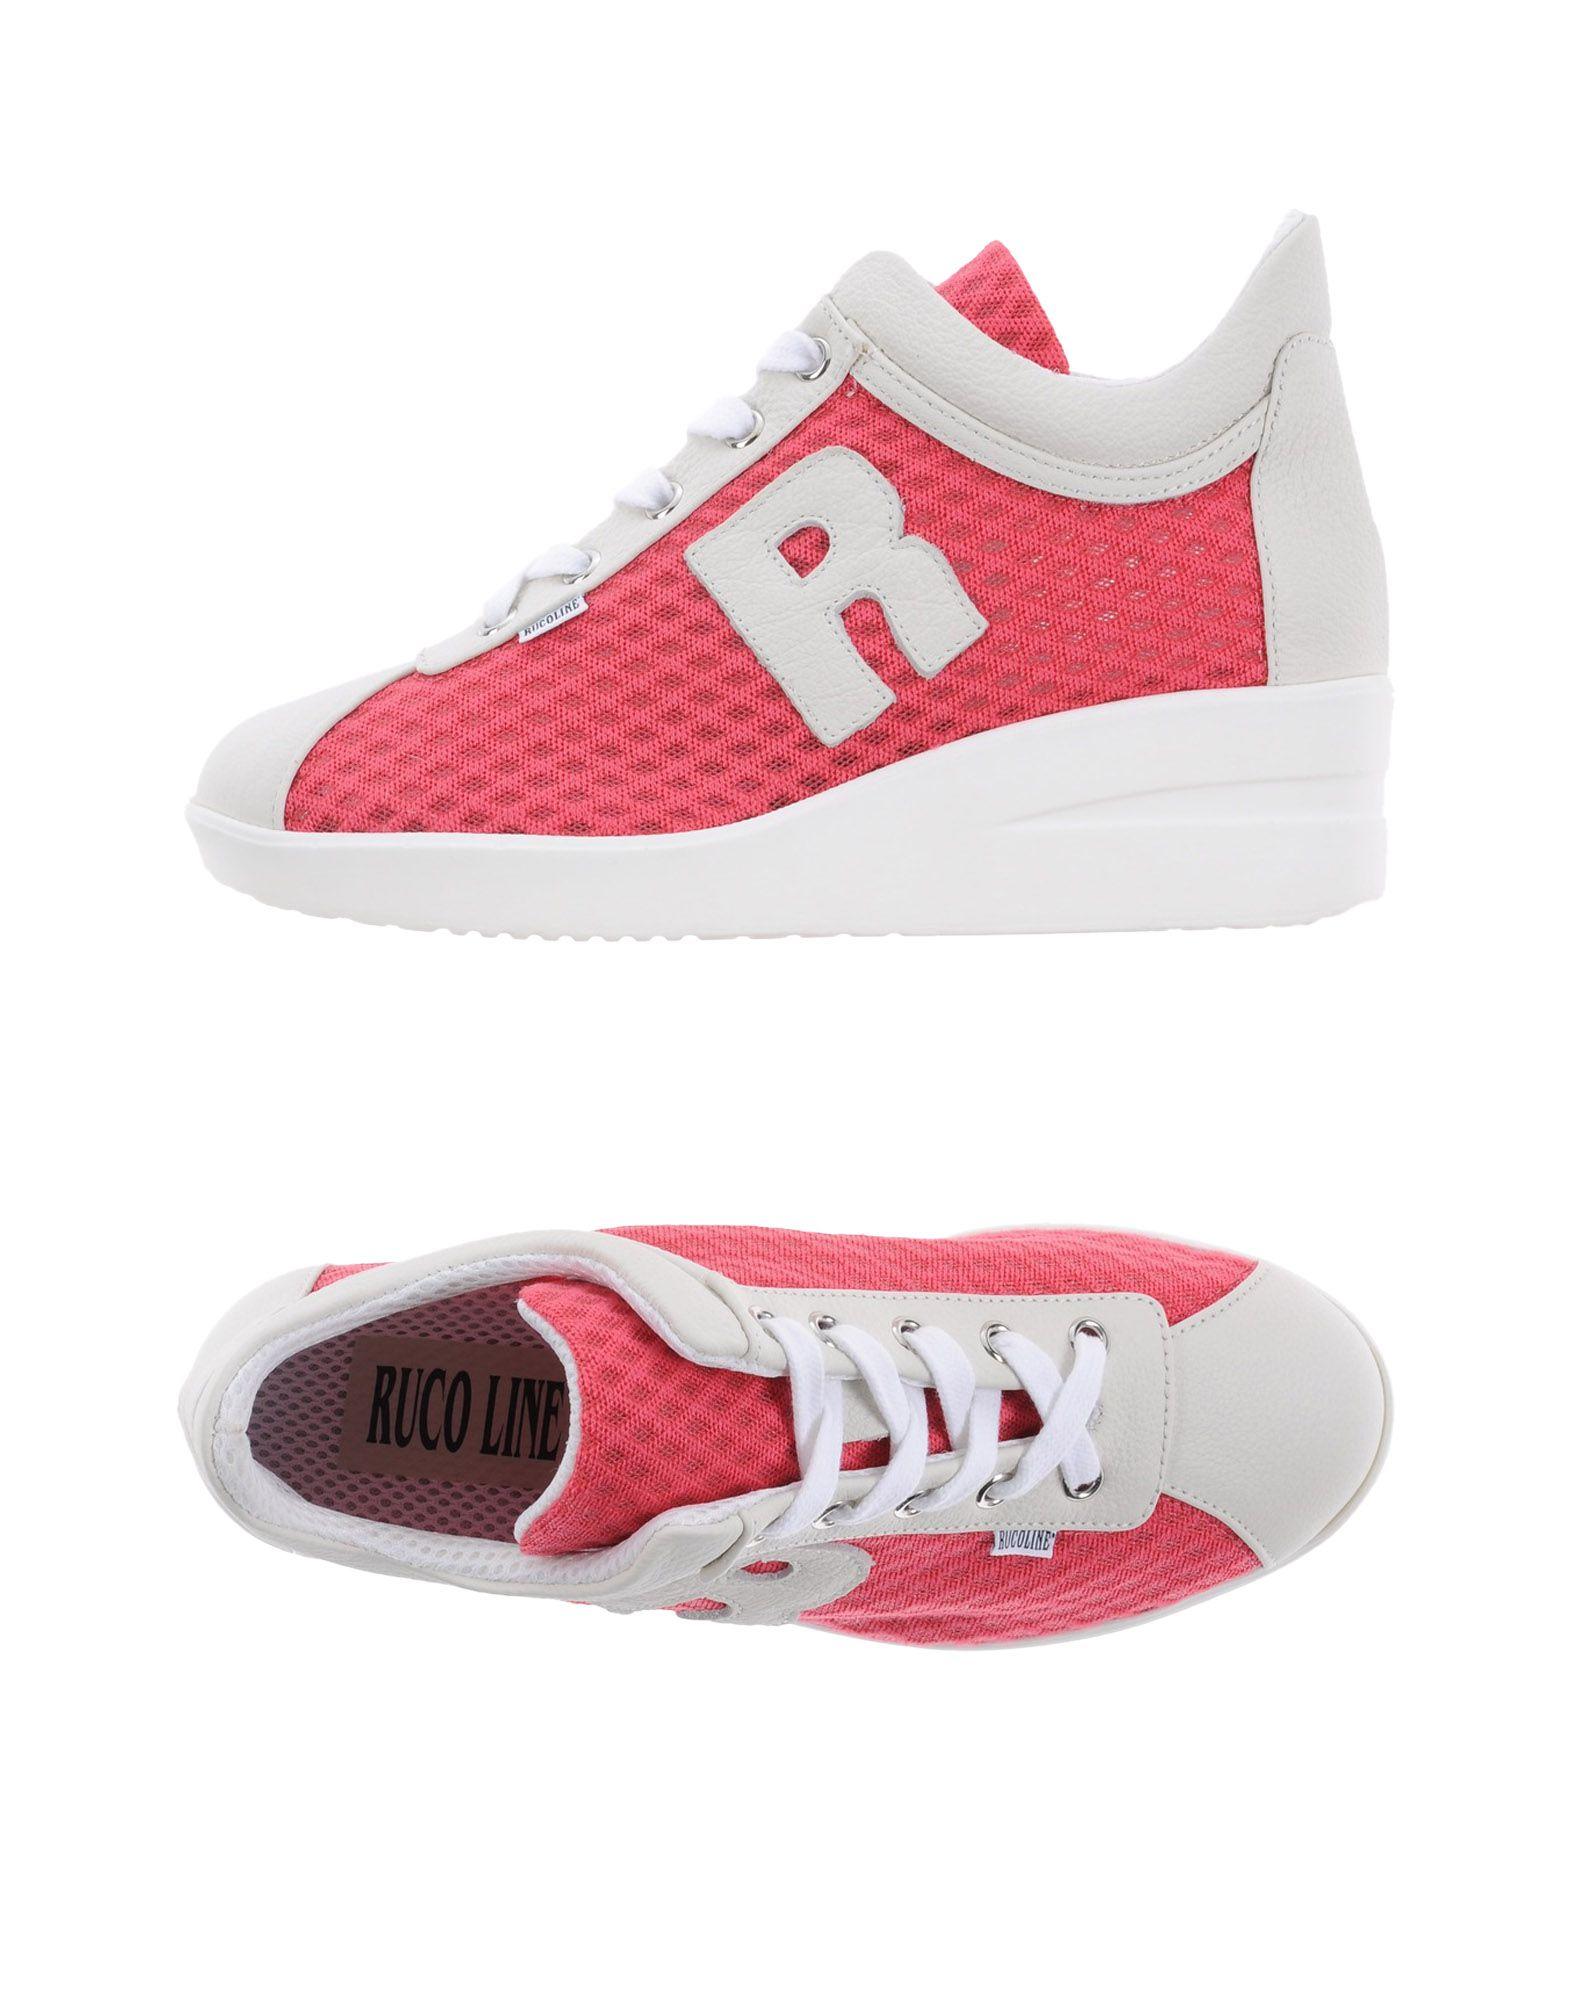 Ruco Ruco Ruco Line Sneakers Damen  11334869DN 66c34b